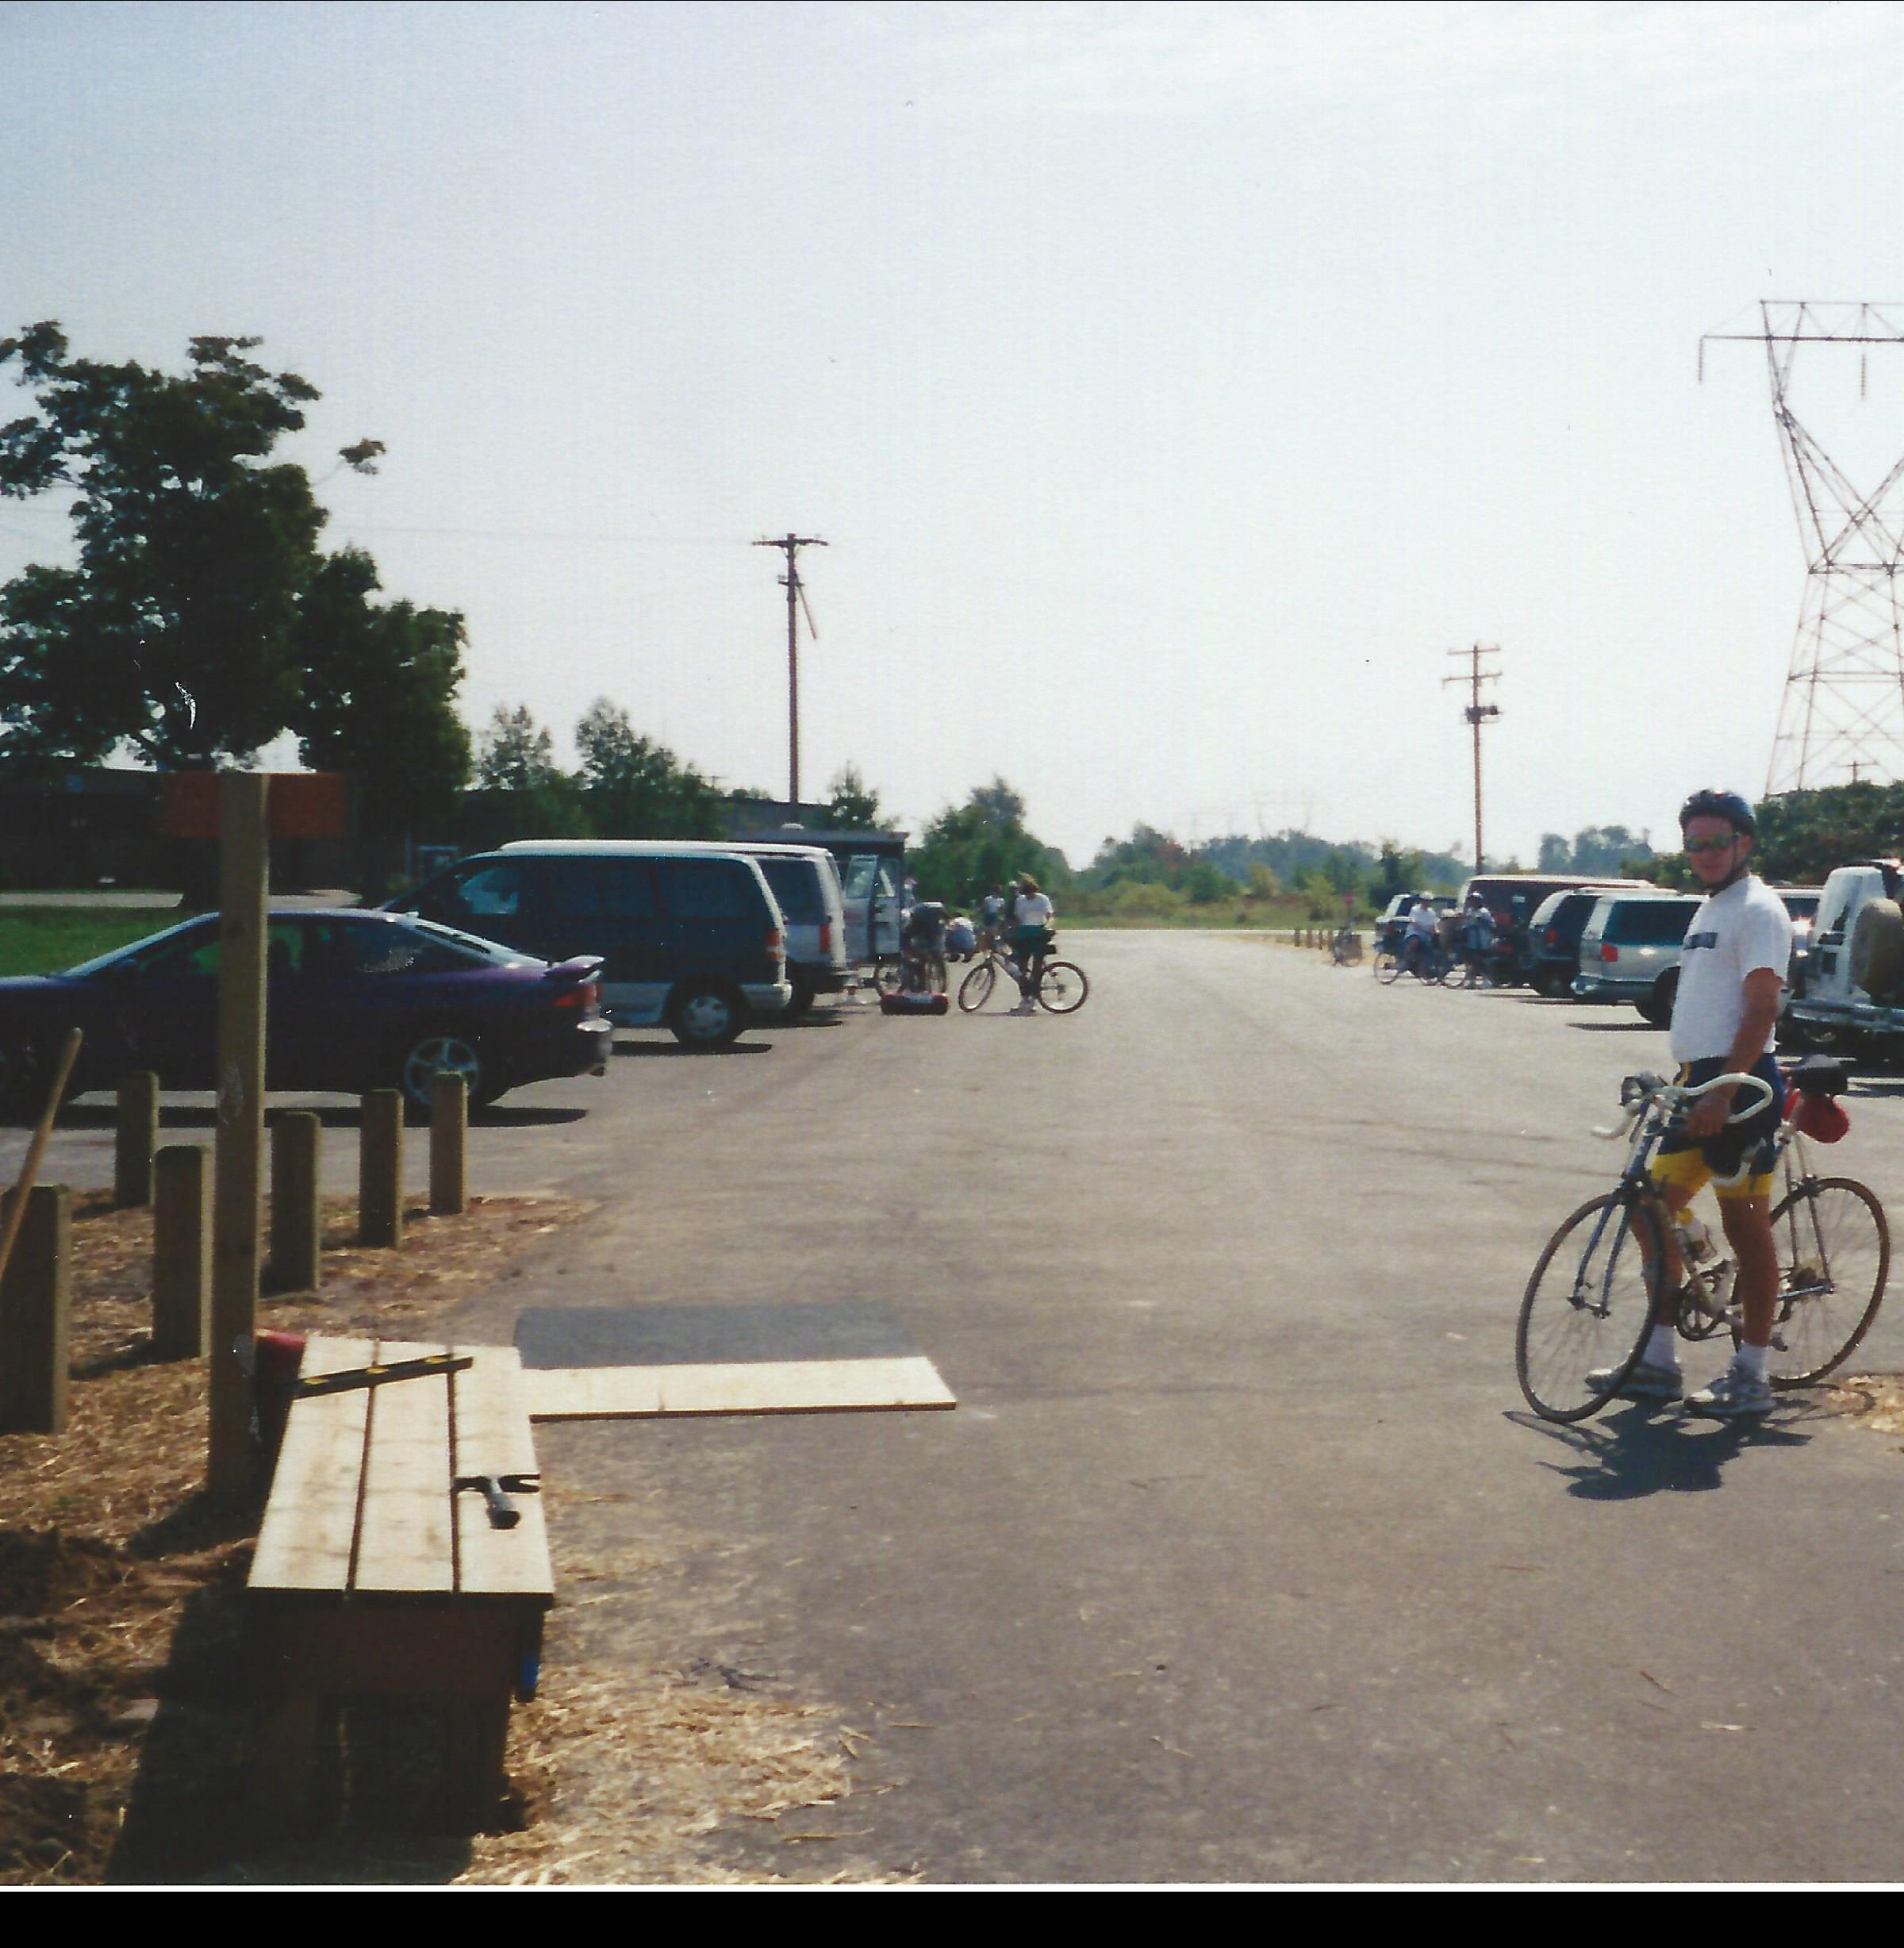 2. Marne Parking Lot